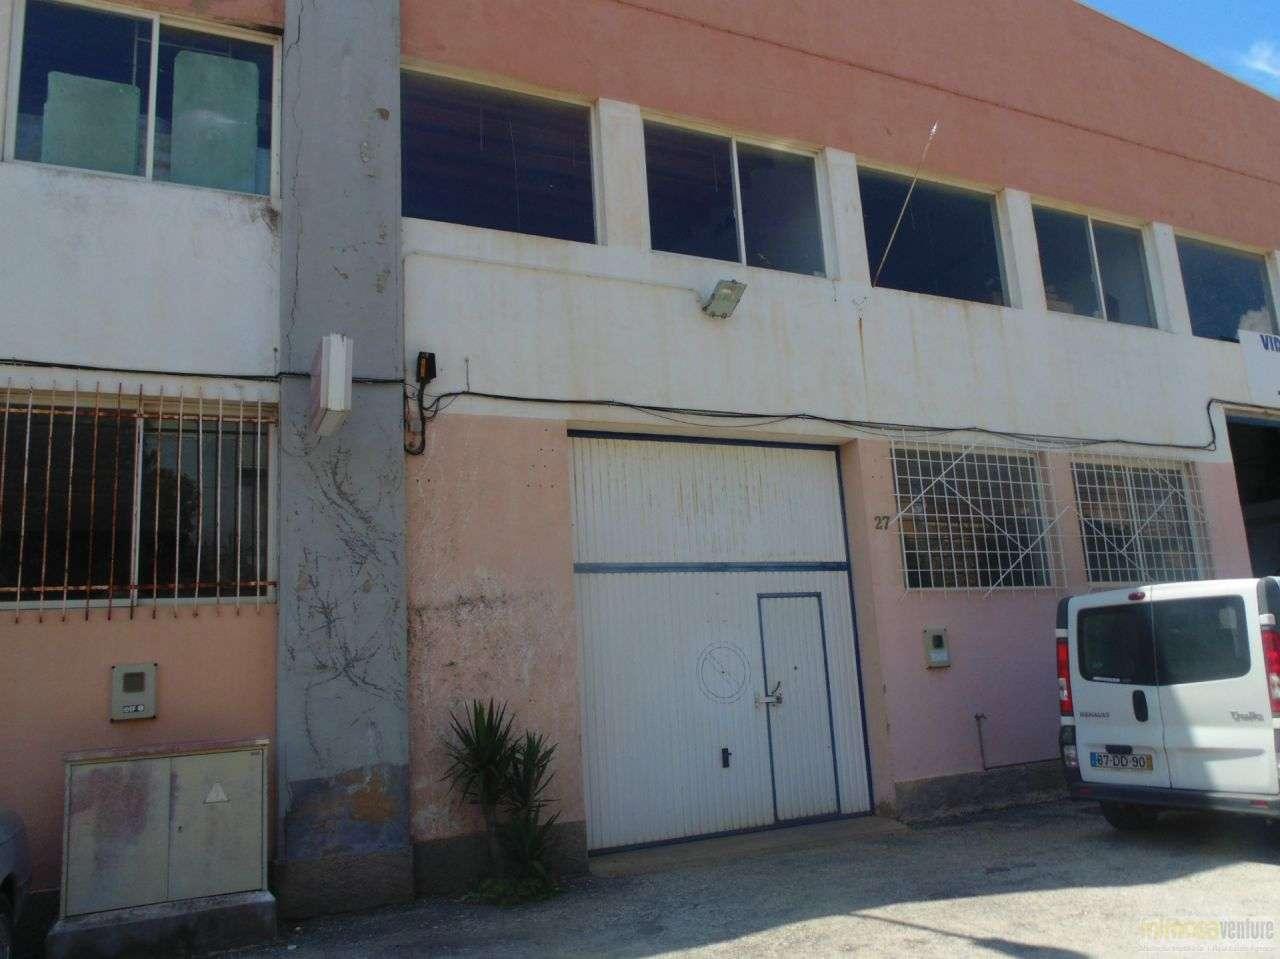 Armazém para arrendar, Odiáxere, Lagos, Faro - Foto 1